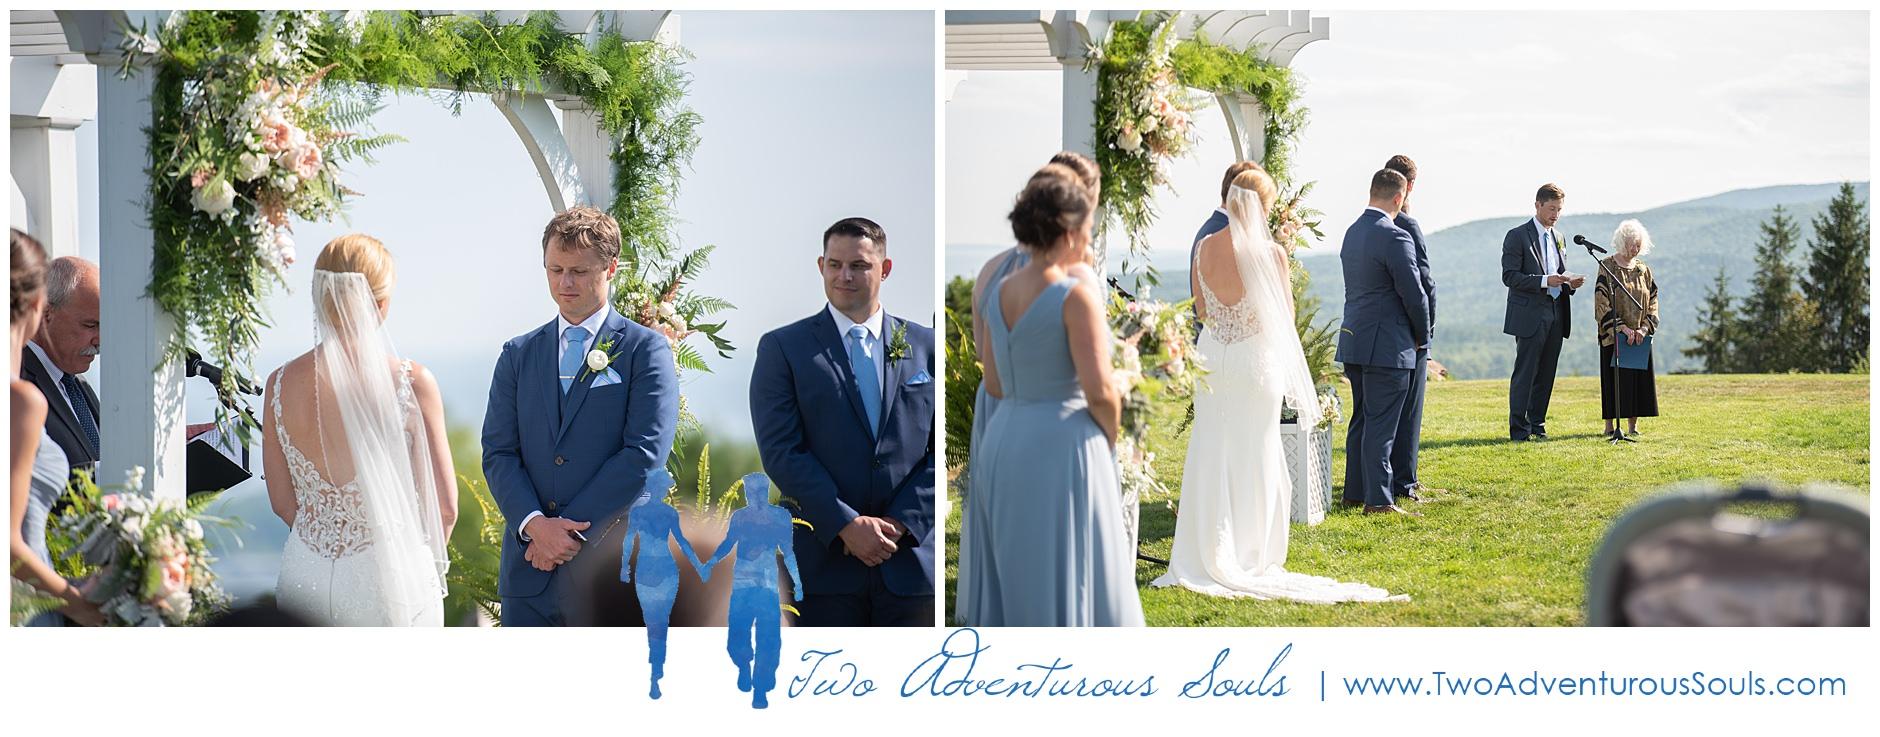 Maine Wedding Photographers, Point Lookout Wedding Photographers, Maine Elopement Photographers, Two Adventurous Souls-0080419_0038.jpg